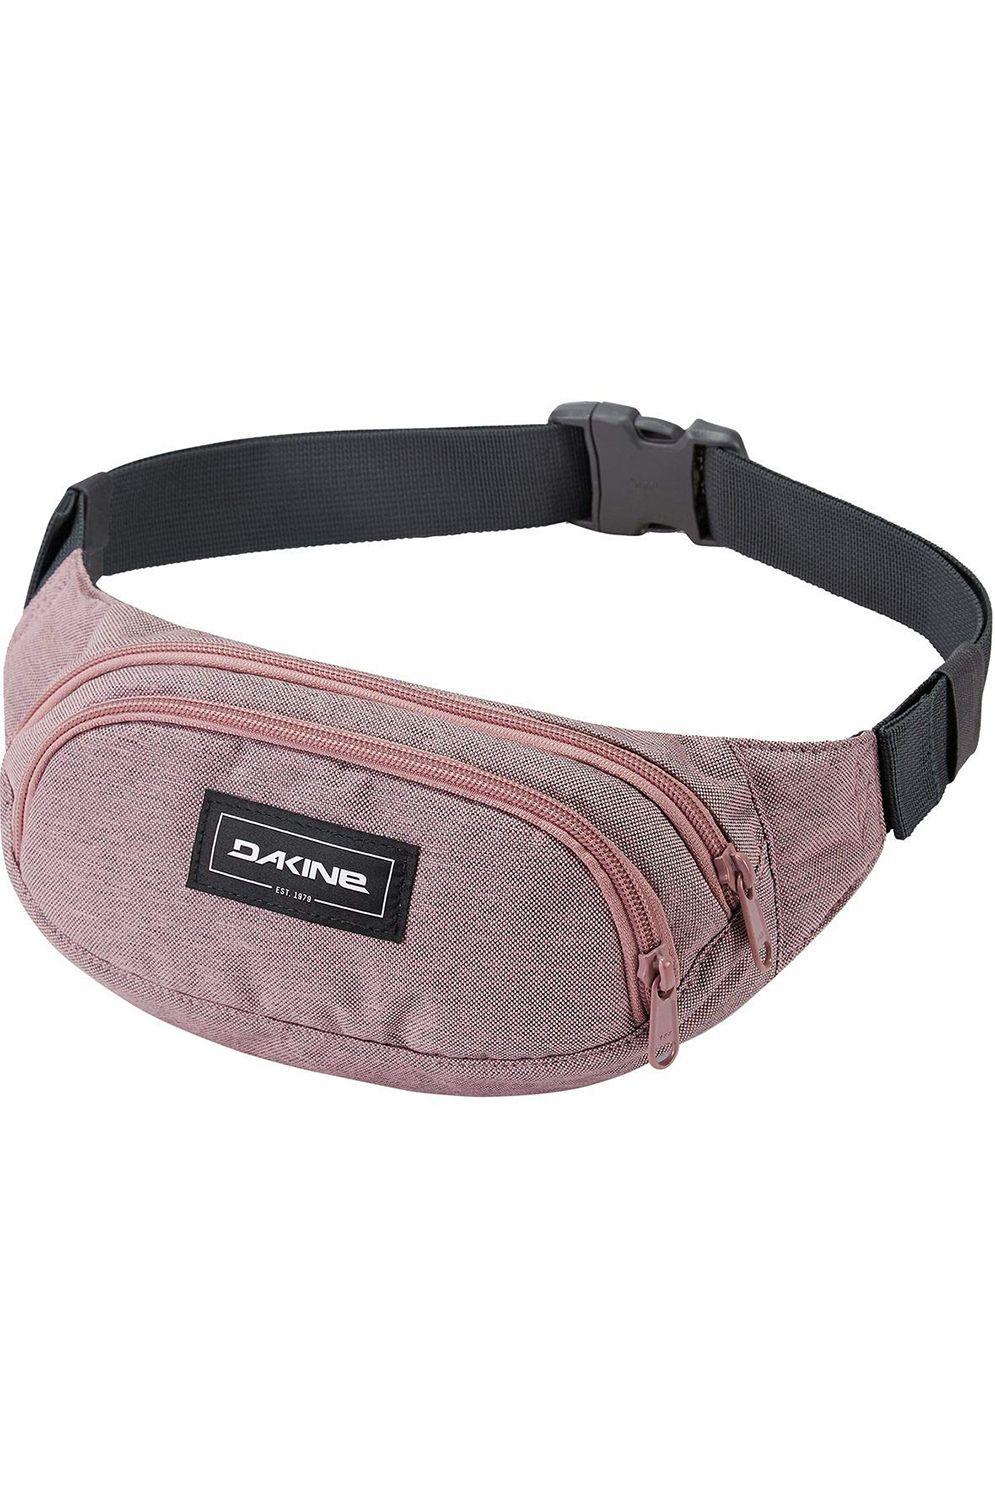 Dakine Waist Bag HIP PACK Woodrose